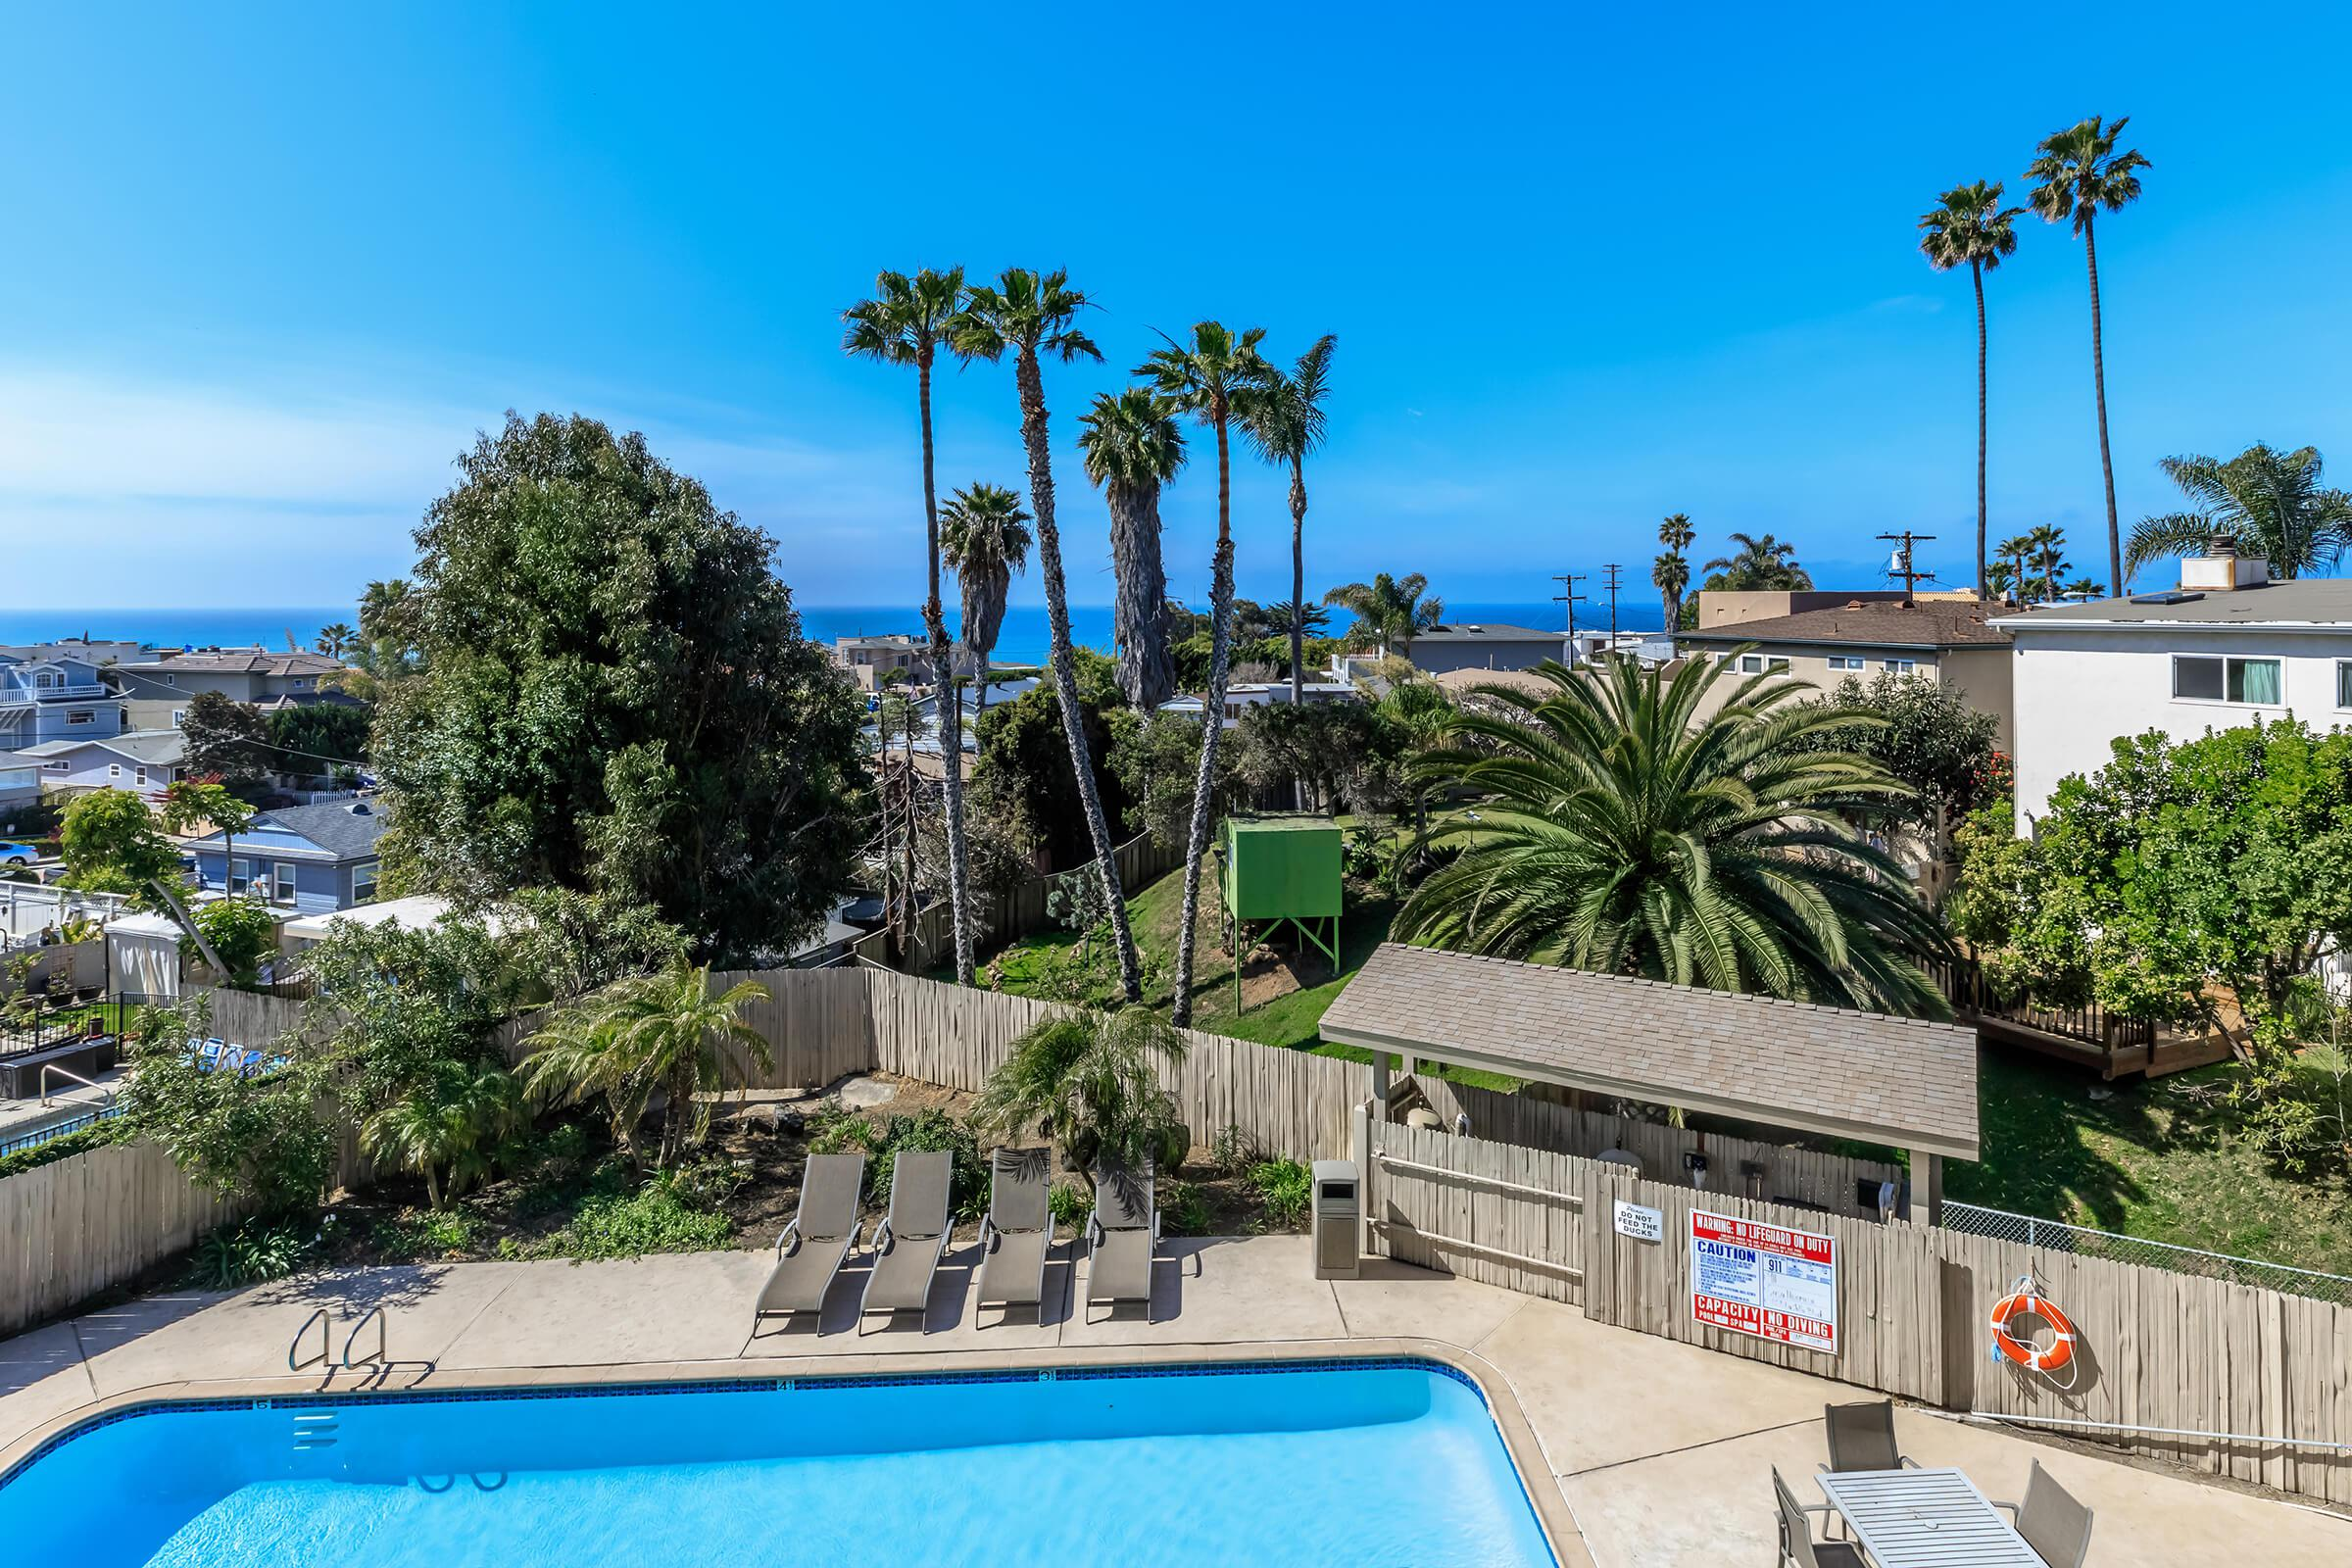 Stunning views at Casa Del Sur in San Diego, CA